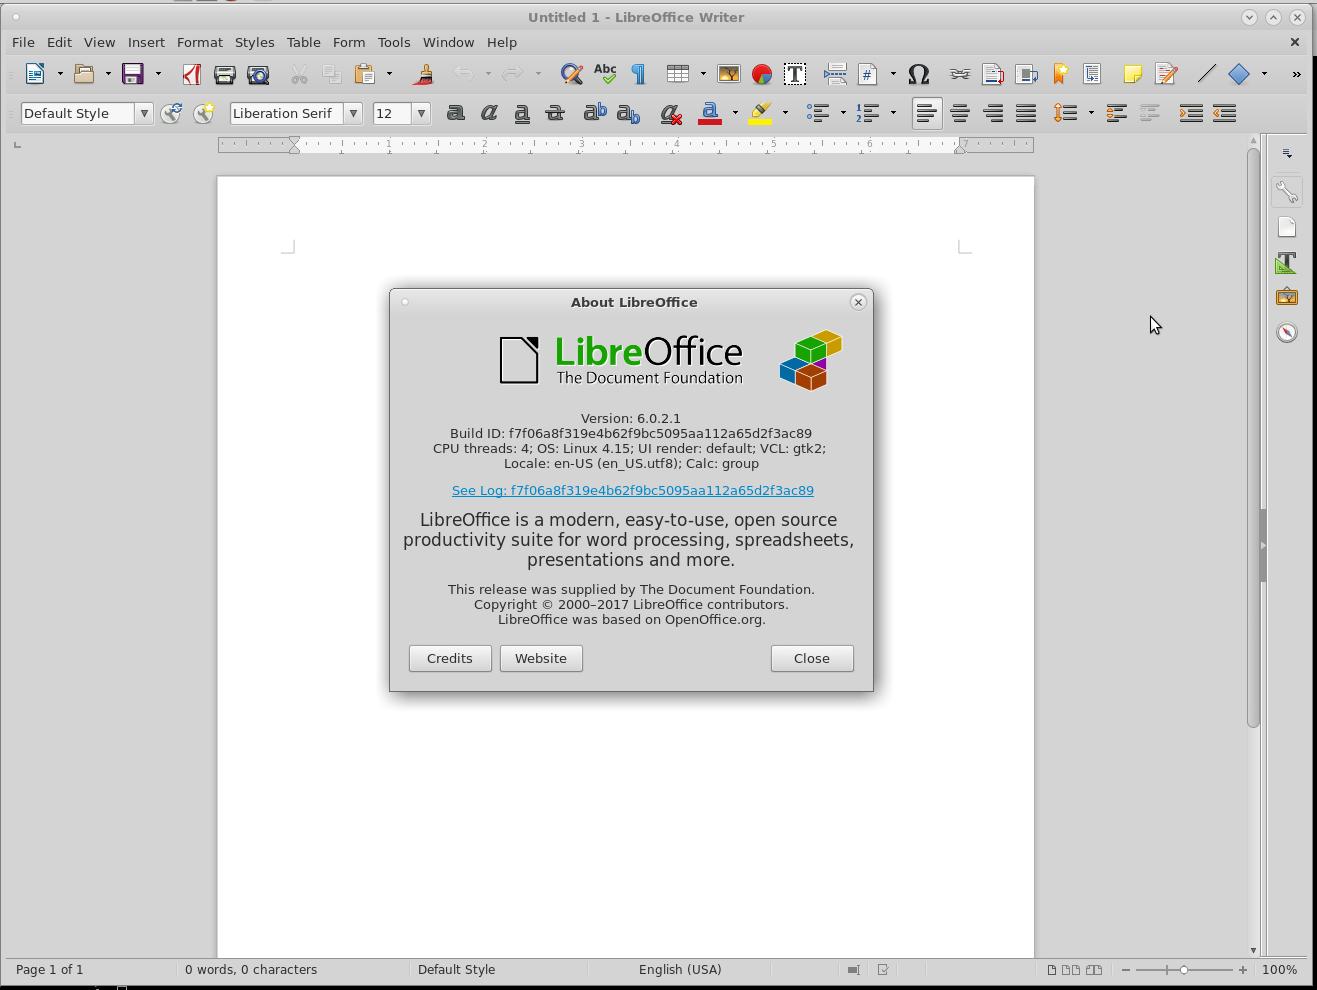 HowTo Update OpenOffice LibreOffice under Linux – deb rpm Debian Ubuntu RedHat Fedora CentOS7